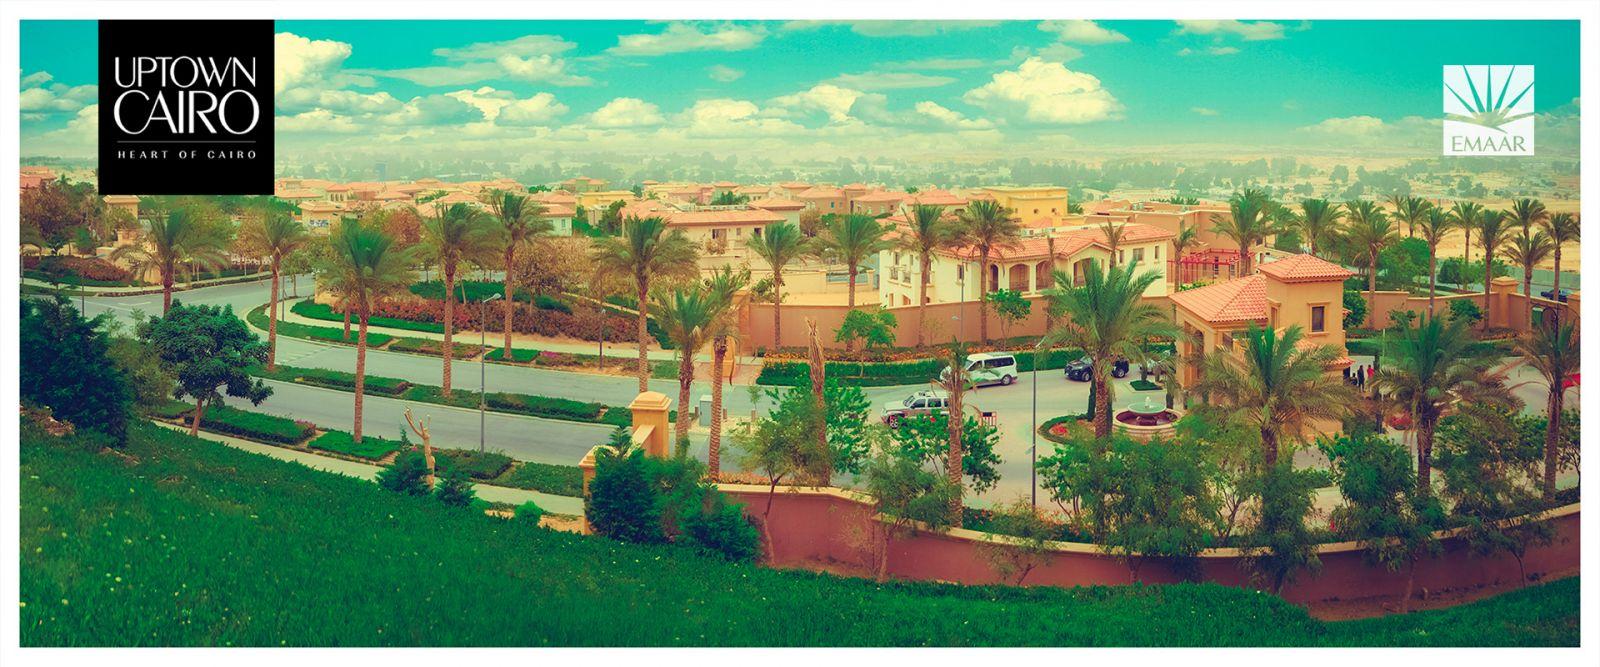 UPTOWN-Cairo-By-Emaar-Misr